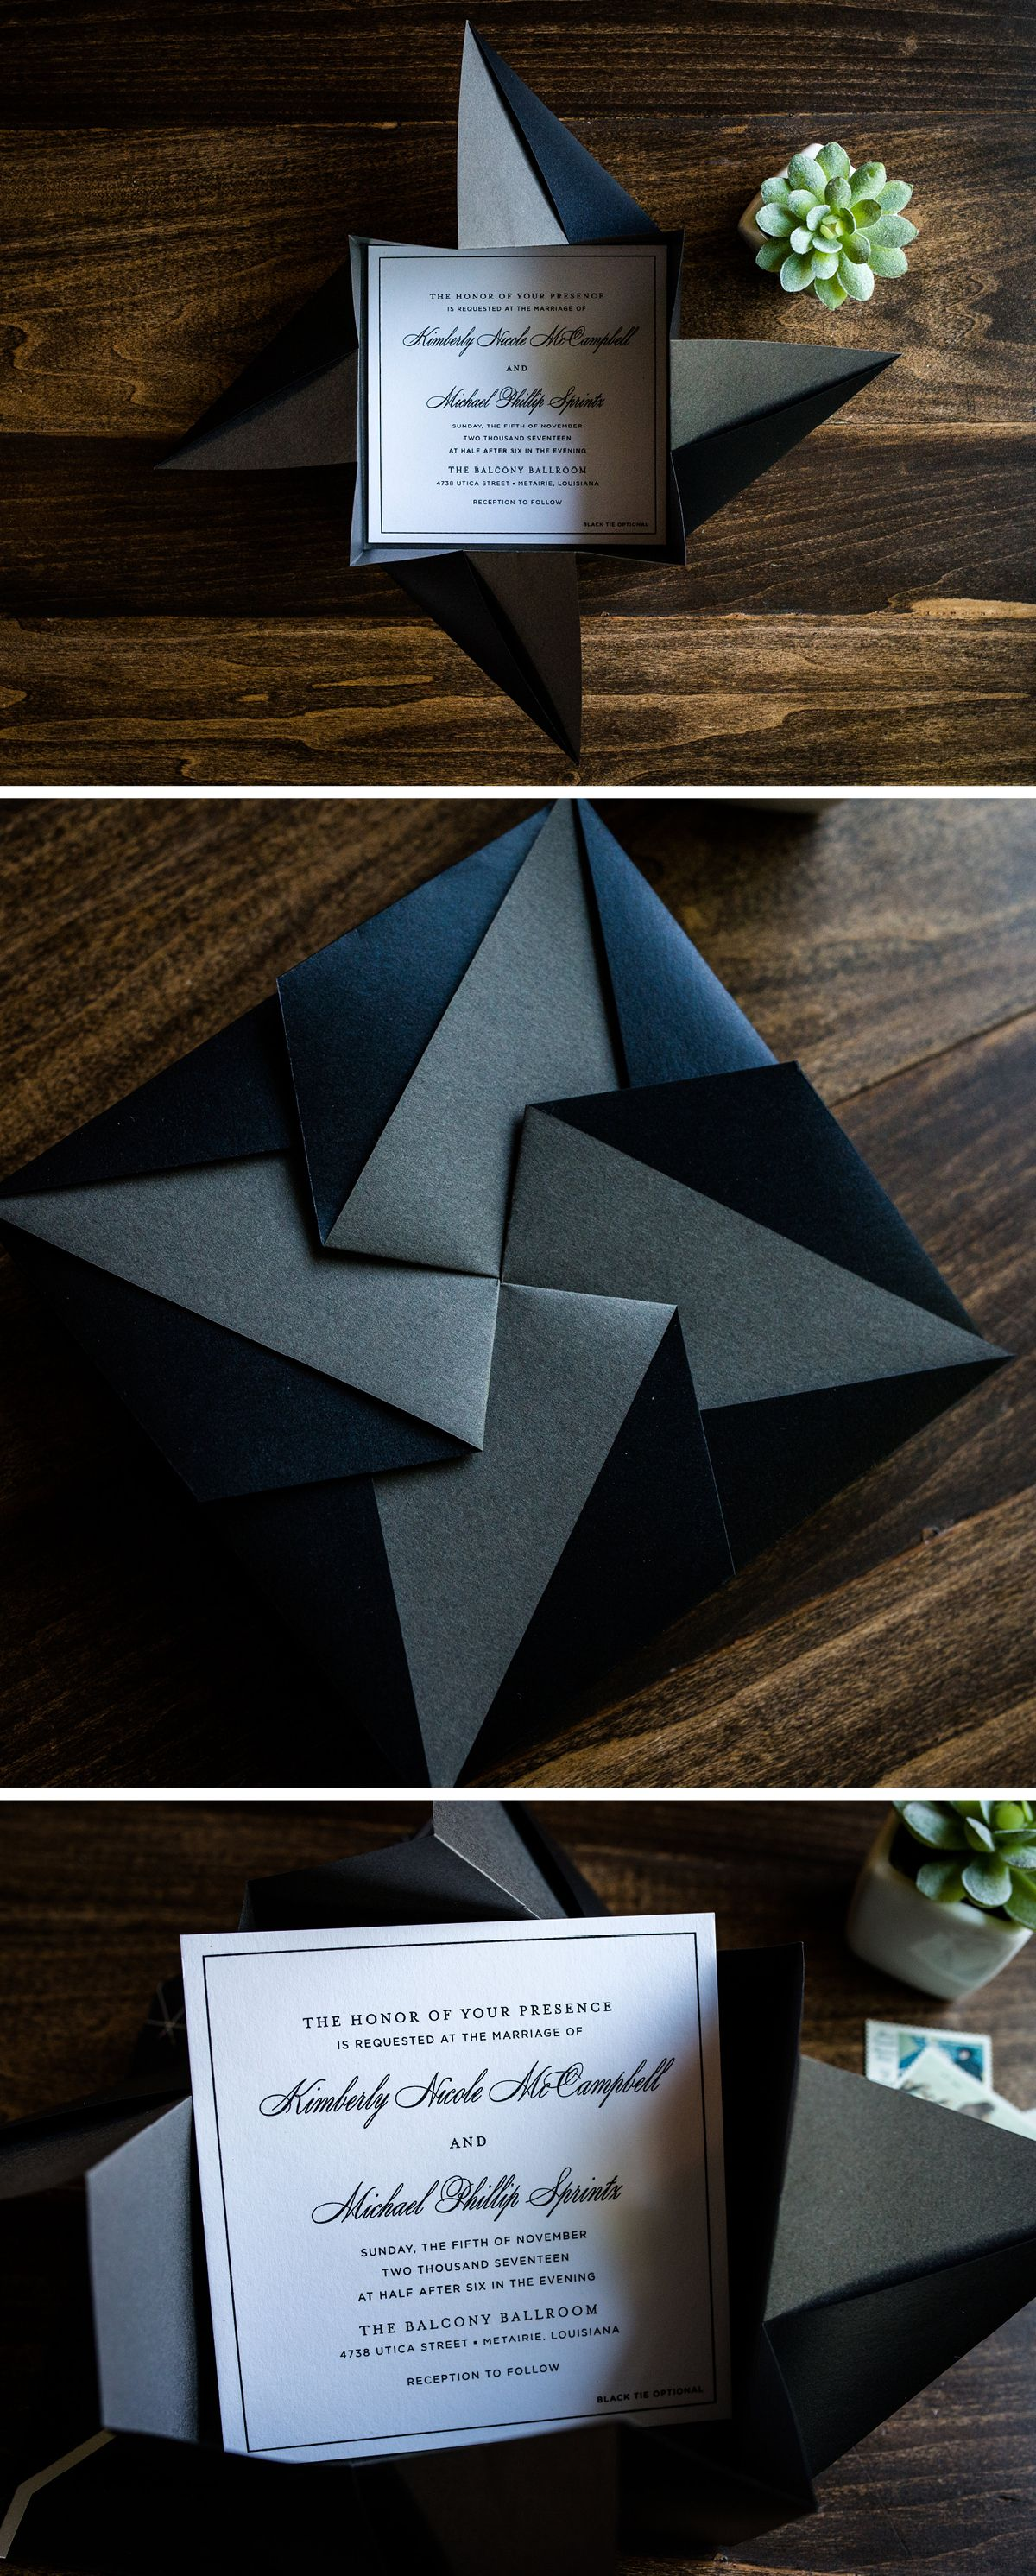 Unique black origami wedding invitation by penn paperie modern unique black origami wedding invitation by penn paperie modern wedding invitation design for black jeuxipadfo Images